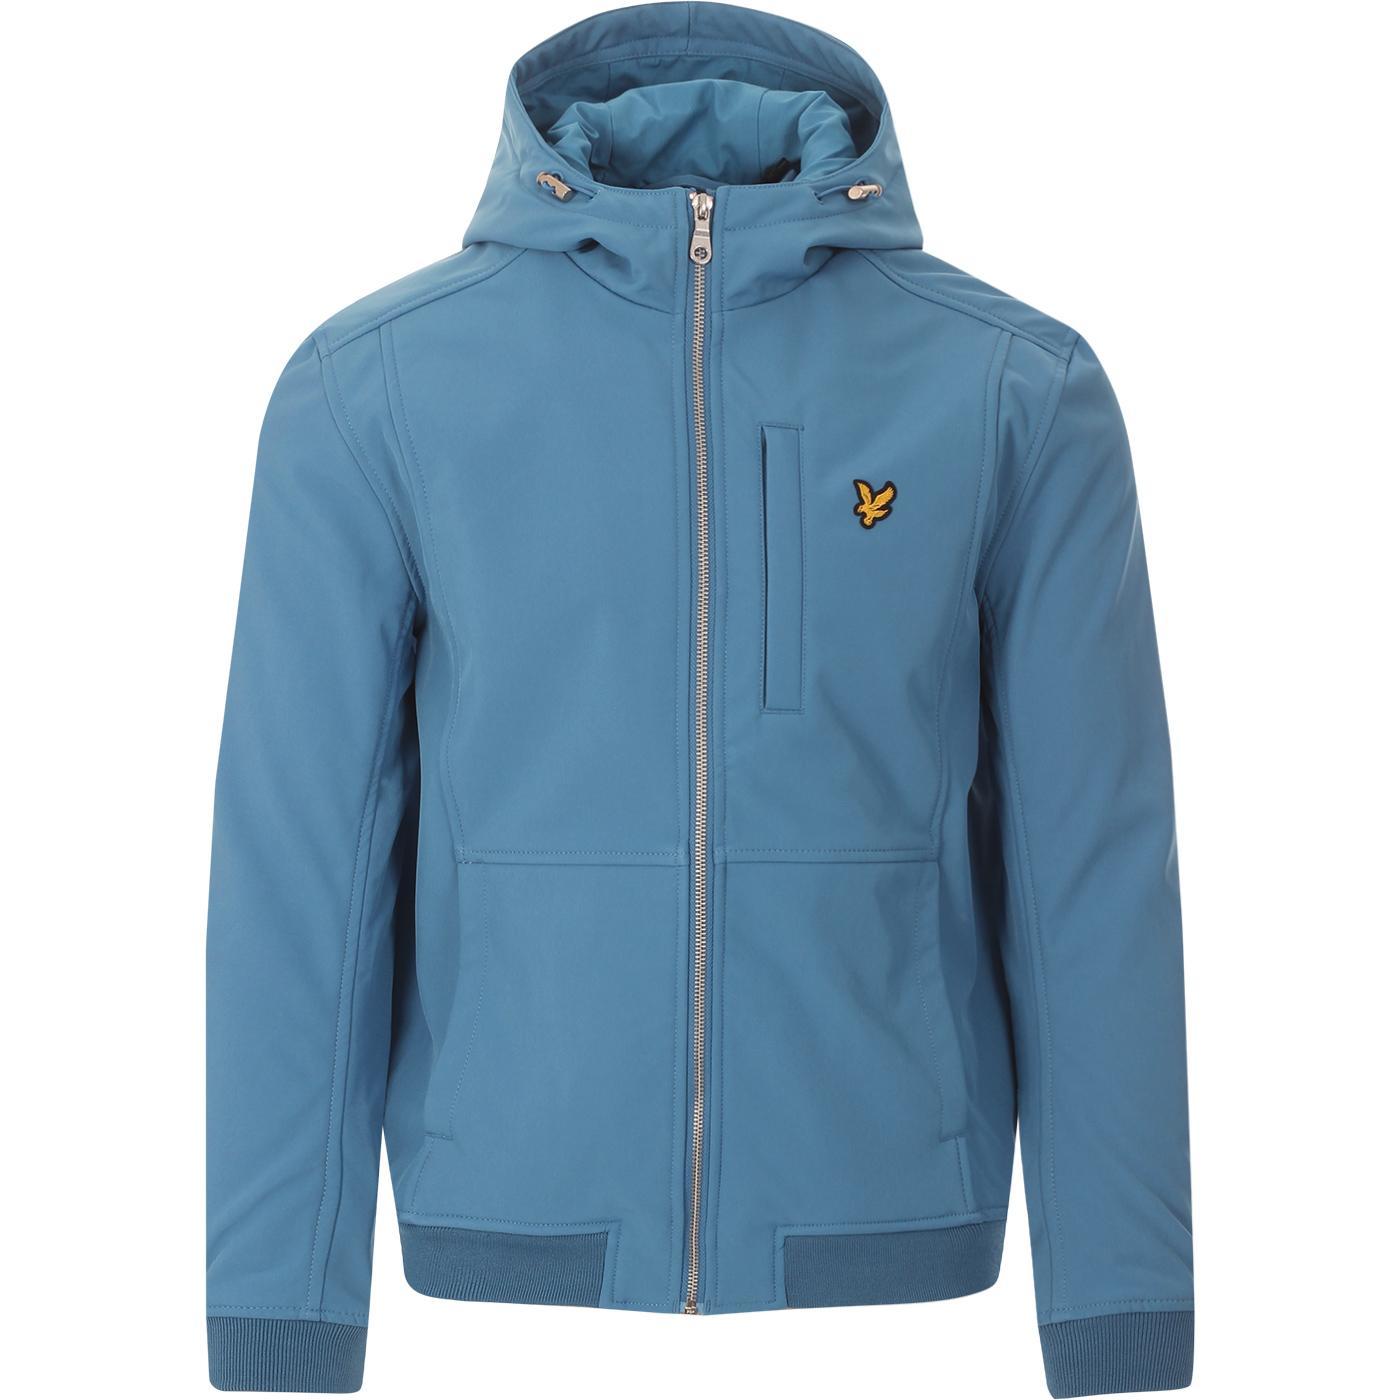 LYLE & SCOTT Retro Casuals Softshell Hooded Jacket